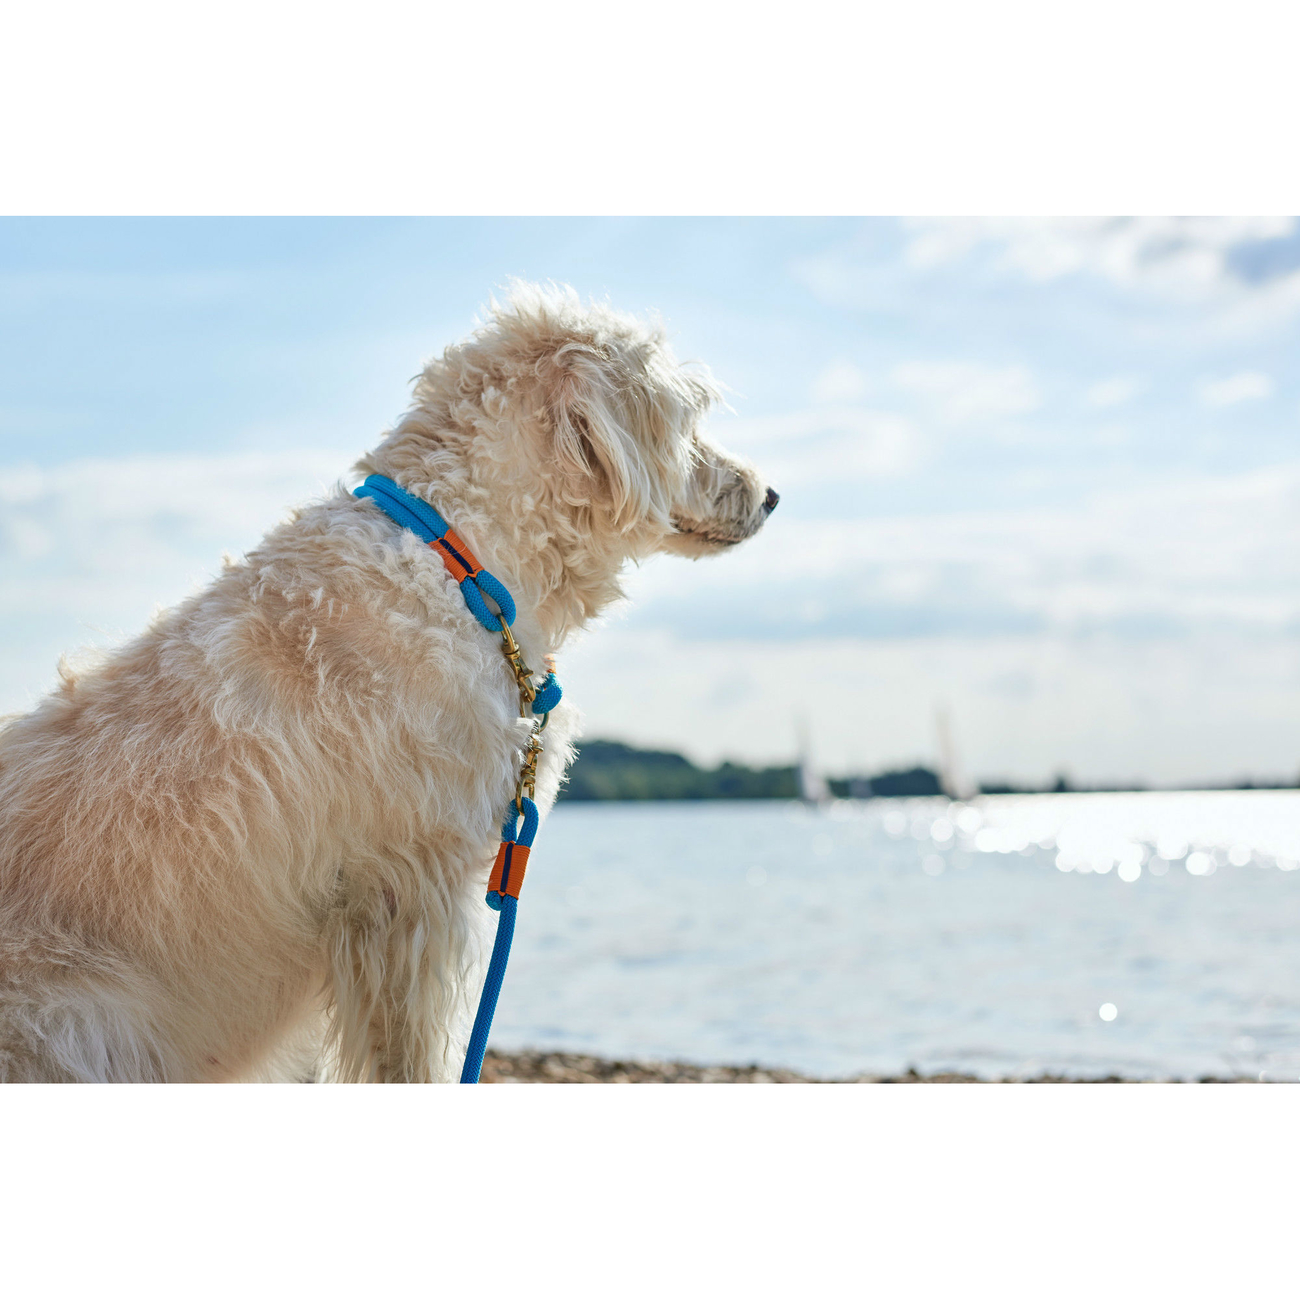 Hunter Halsung Halsband Oss für Hunde 66989, Bild 15